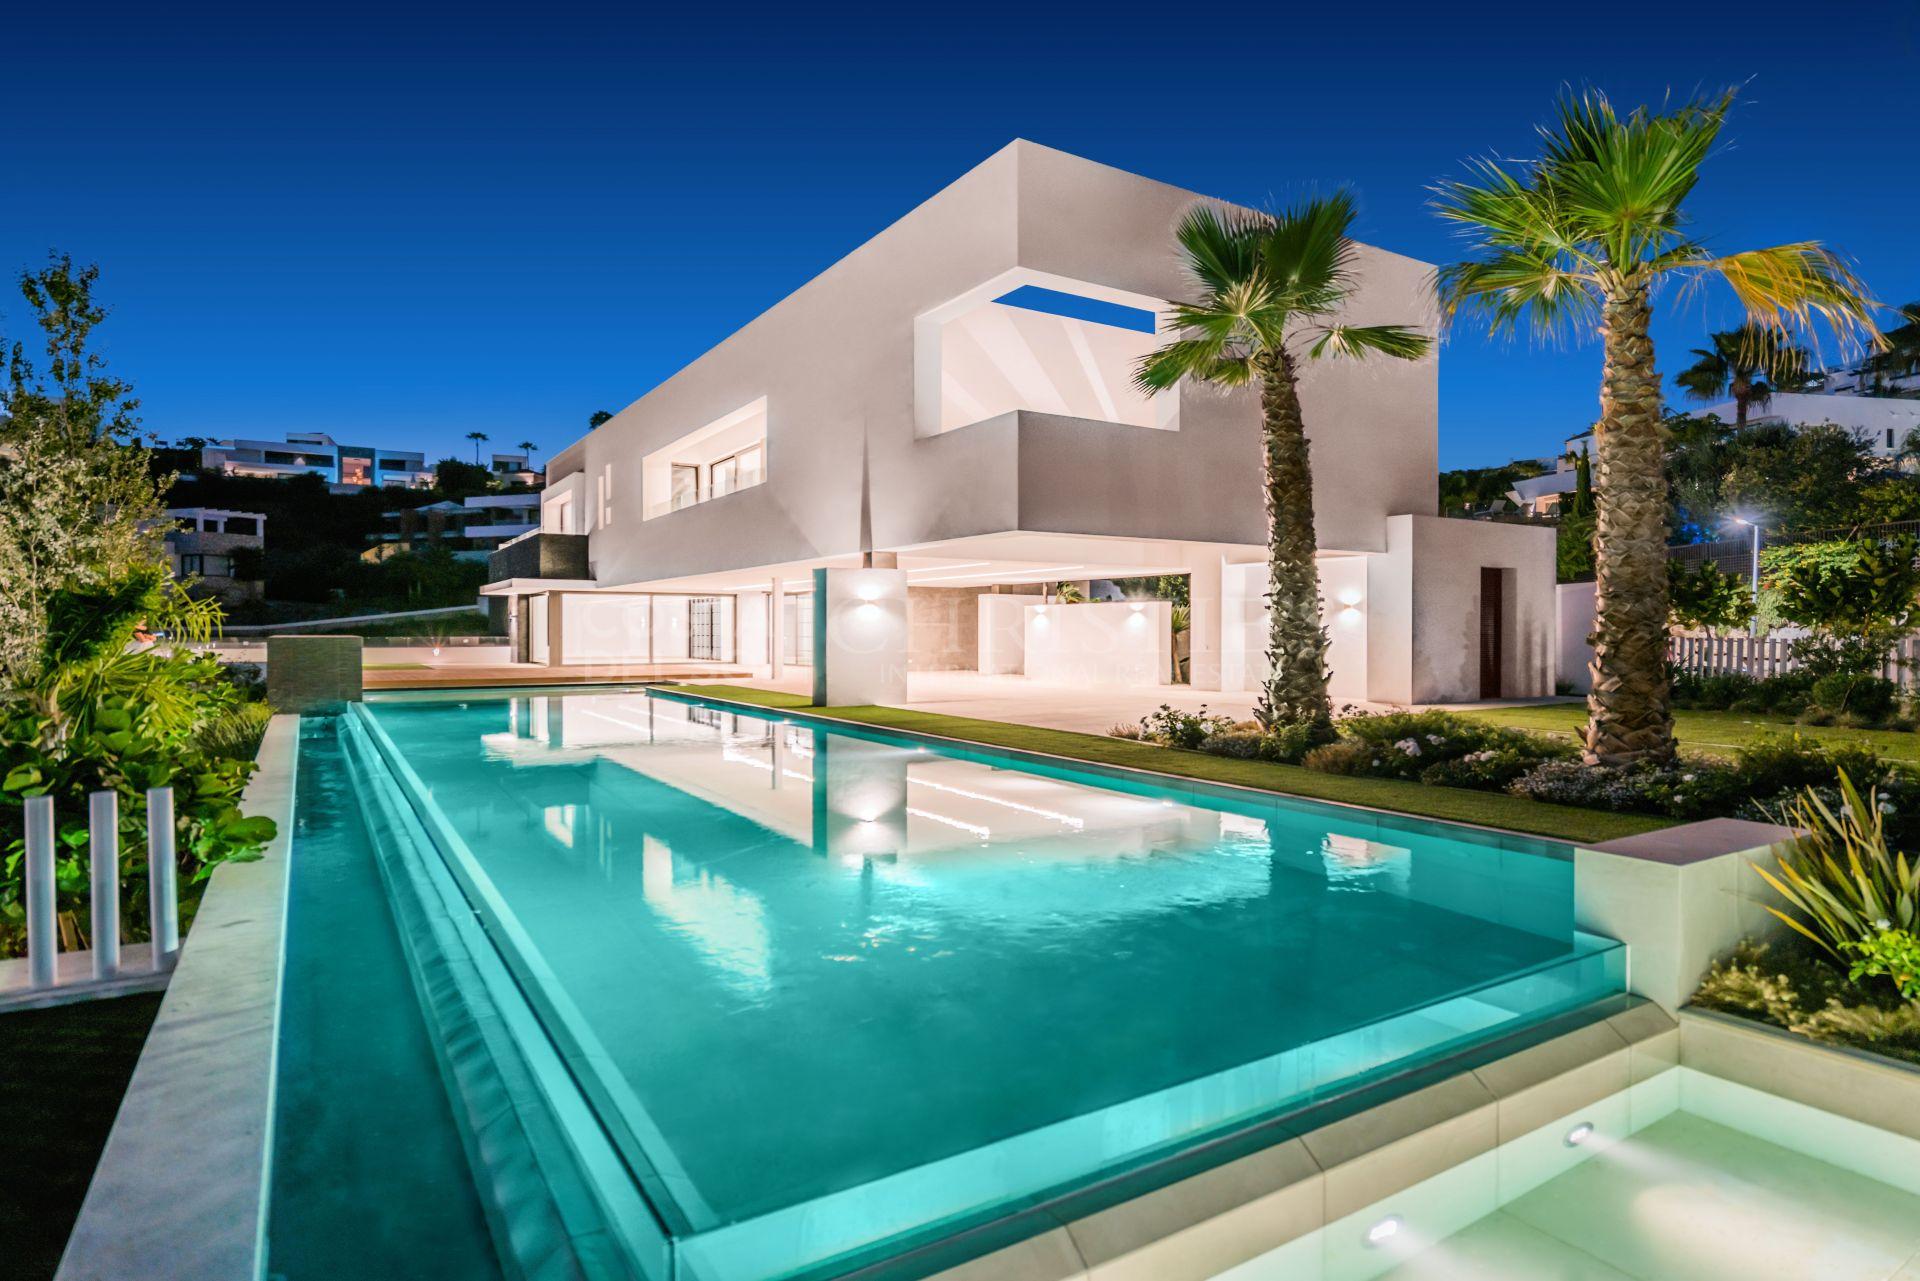 Eco-Friendly Villa in La Alqueria, Benahavis | Christie's International Real Estate